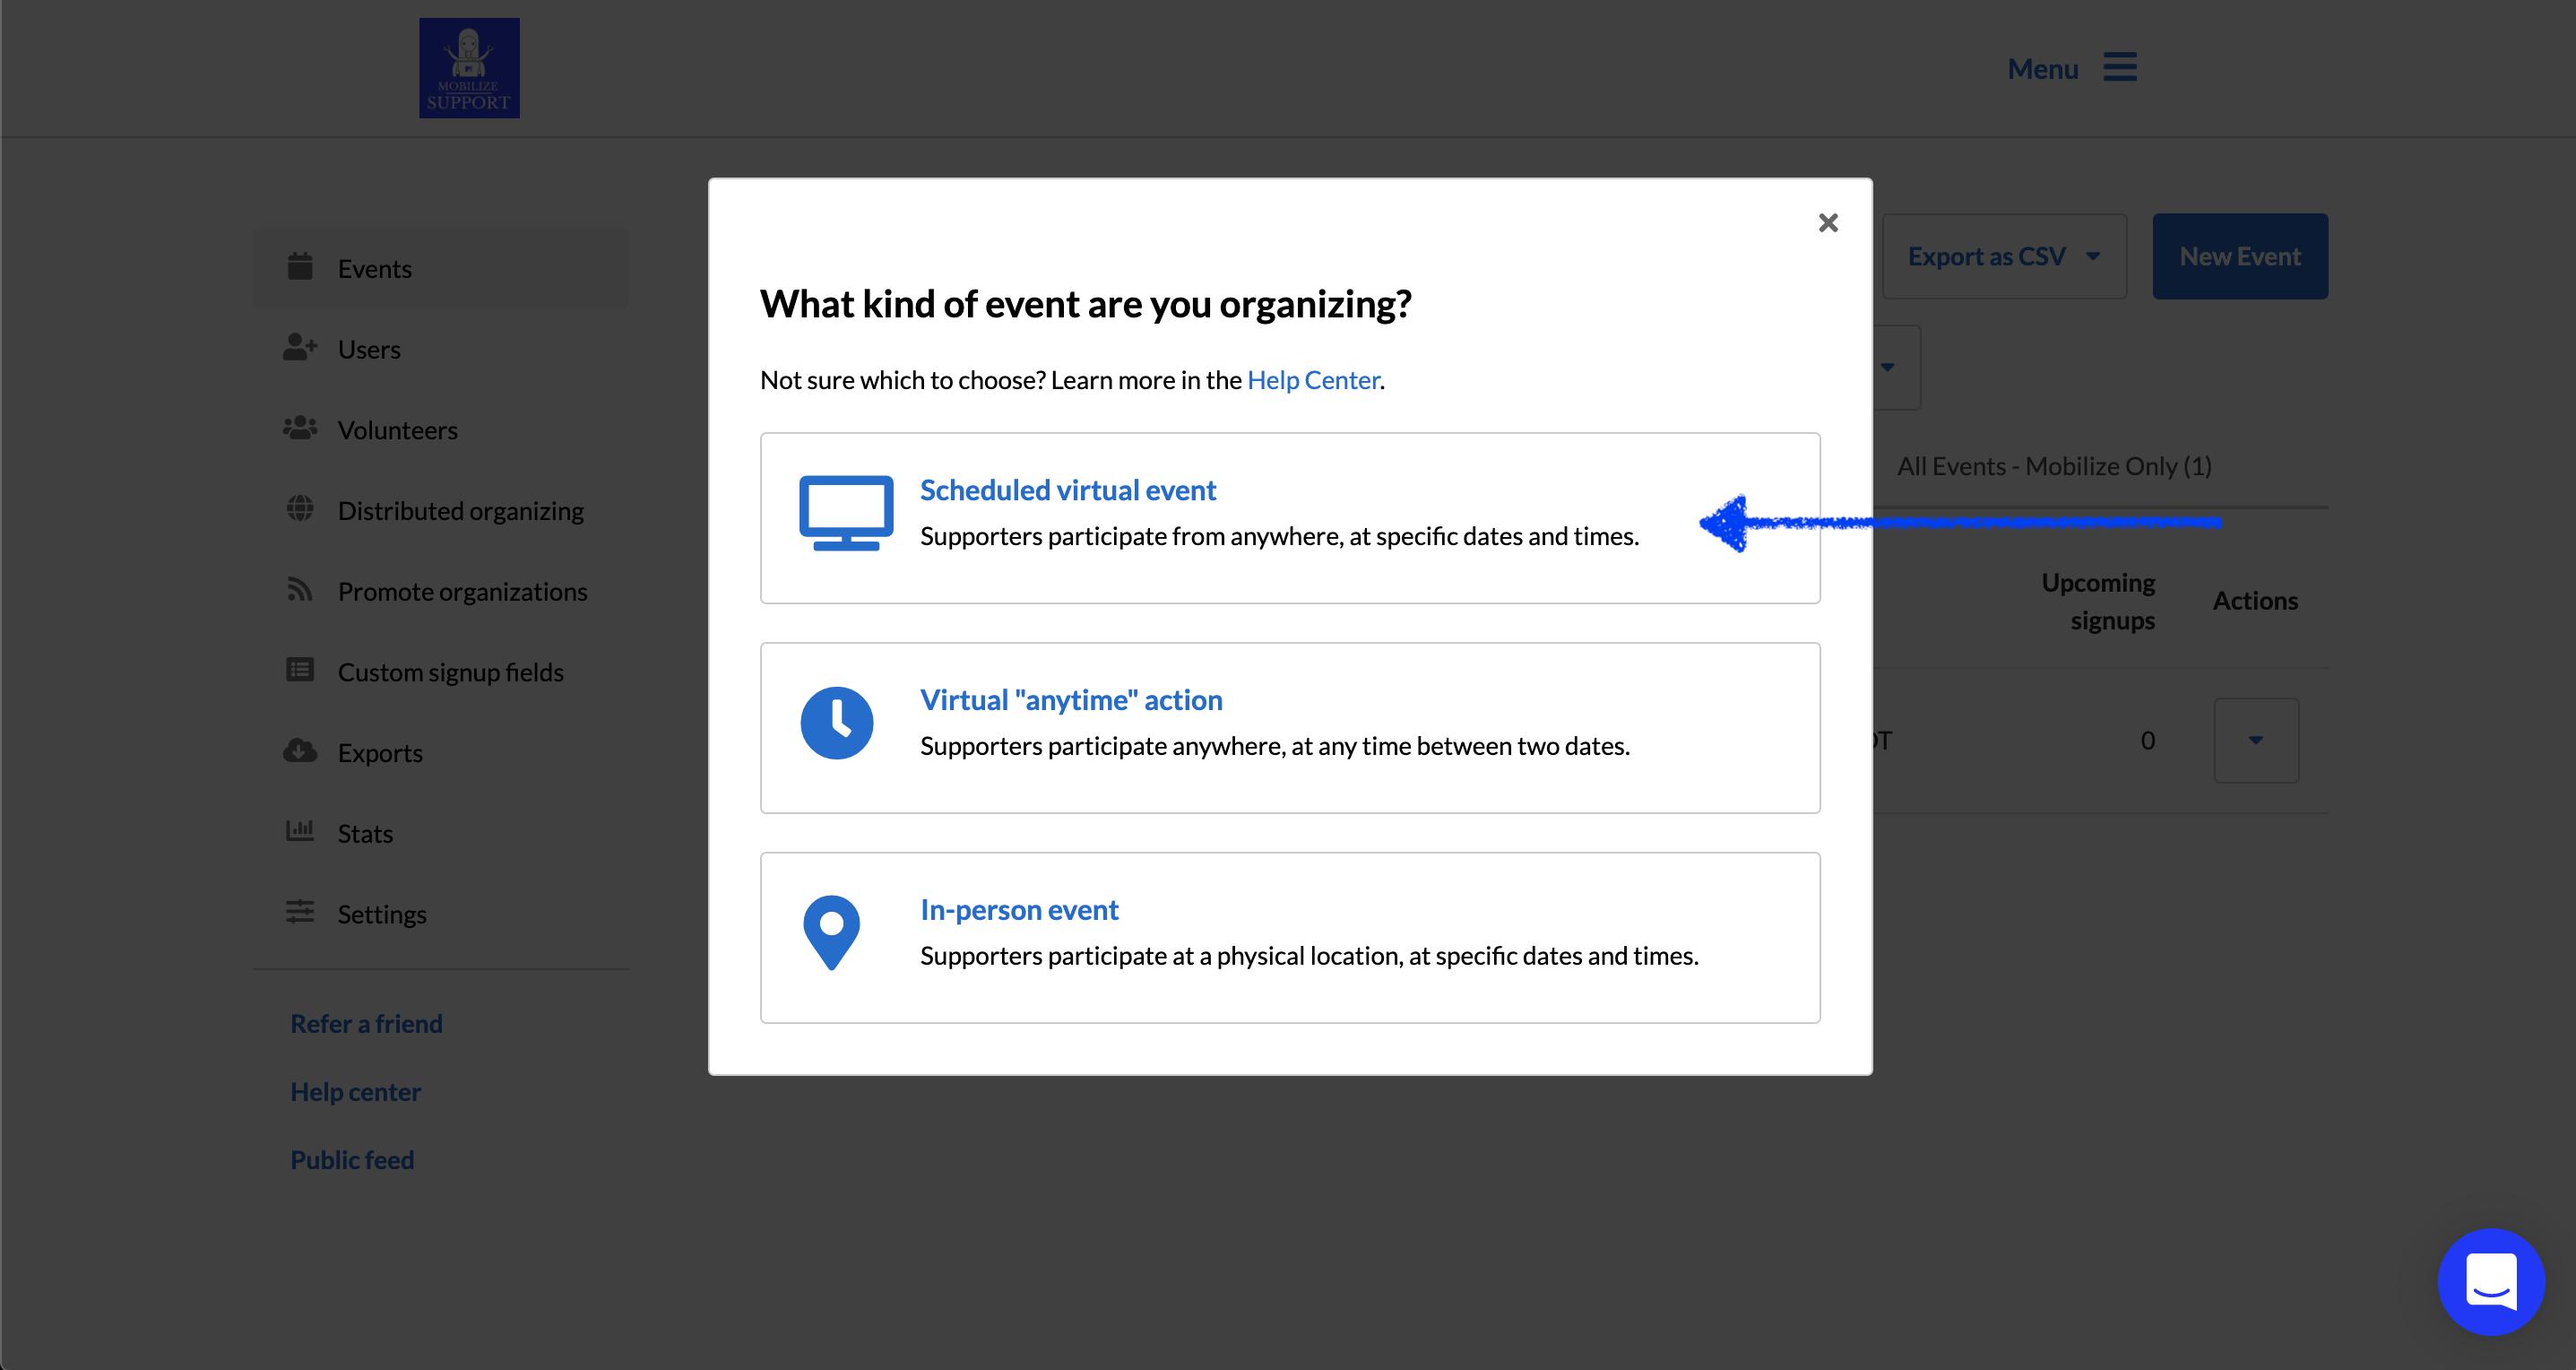 Screenshot of Event Creation screen: Select Scheduled virtual event button